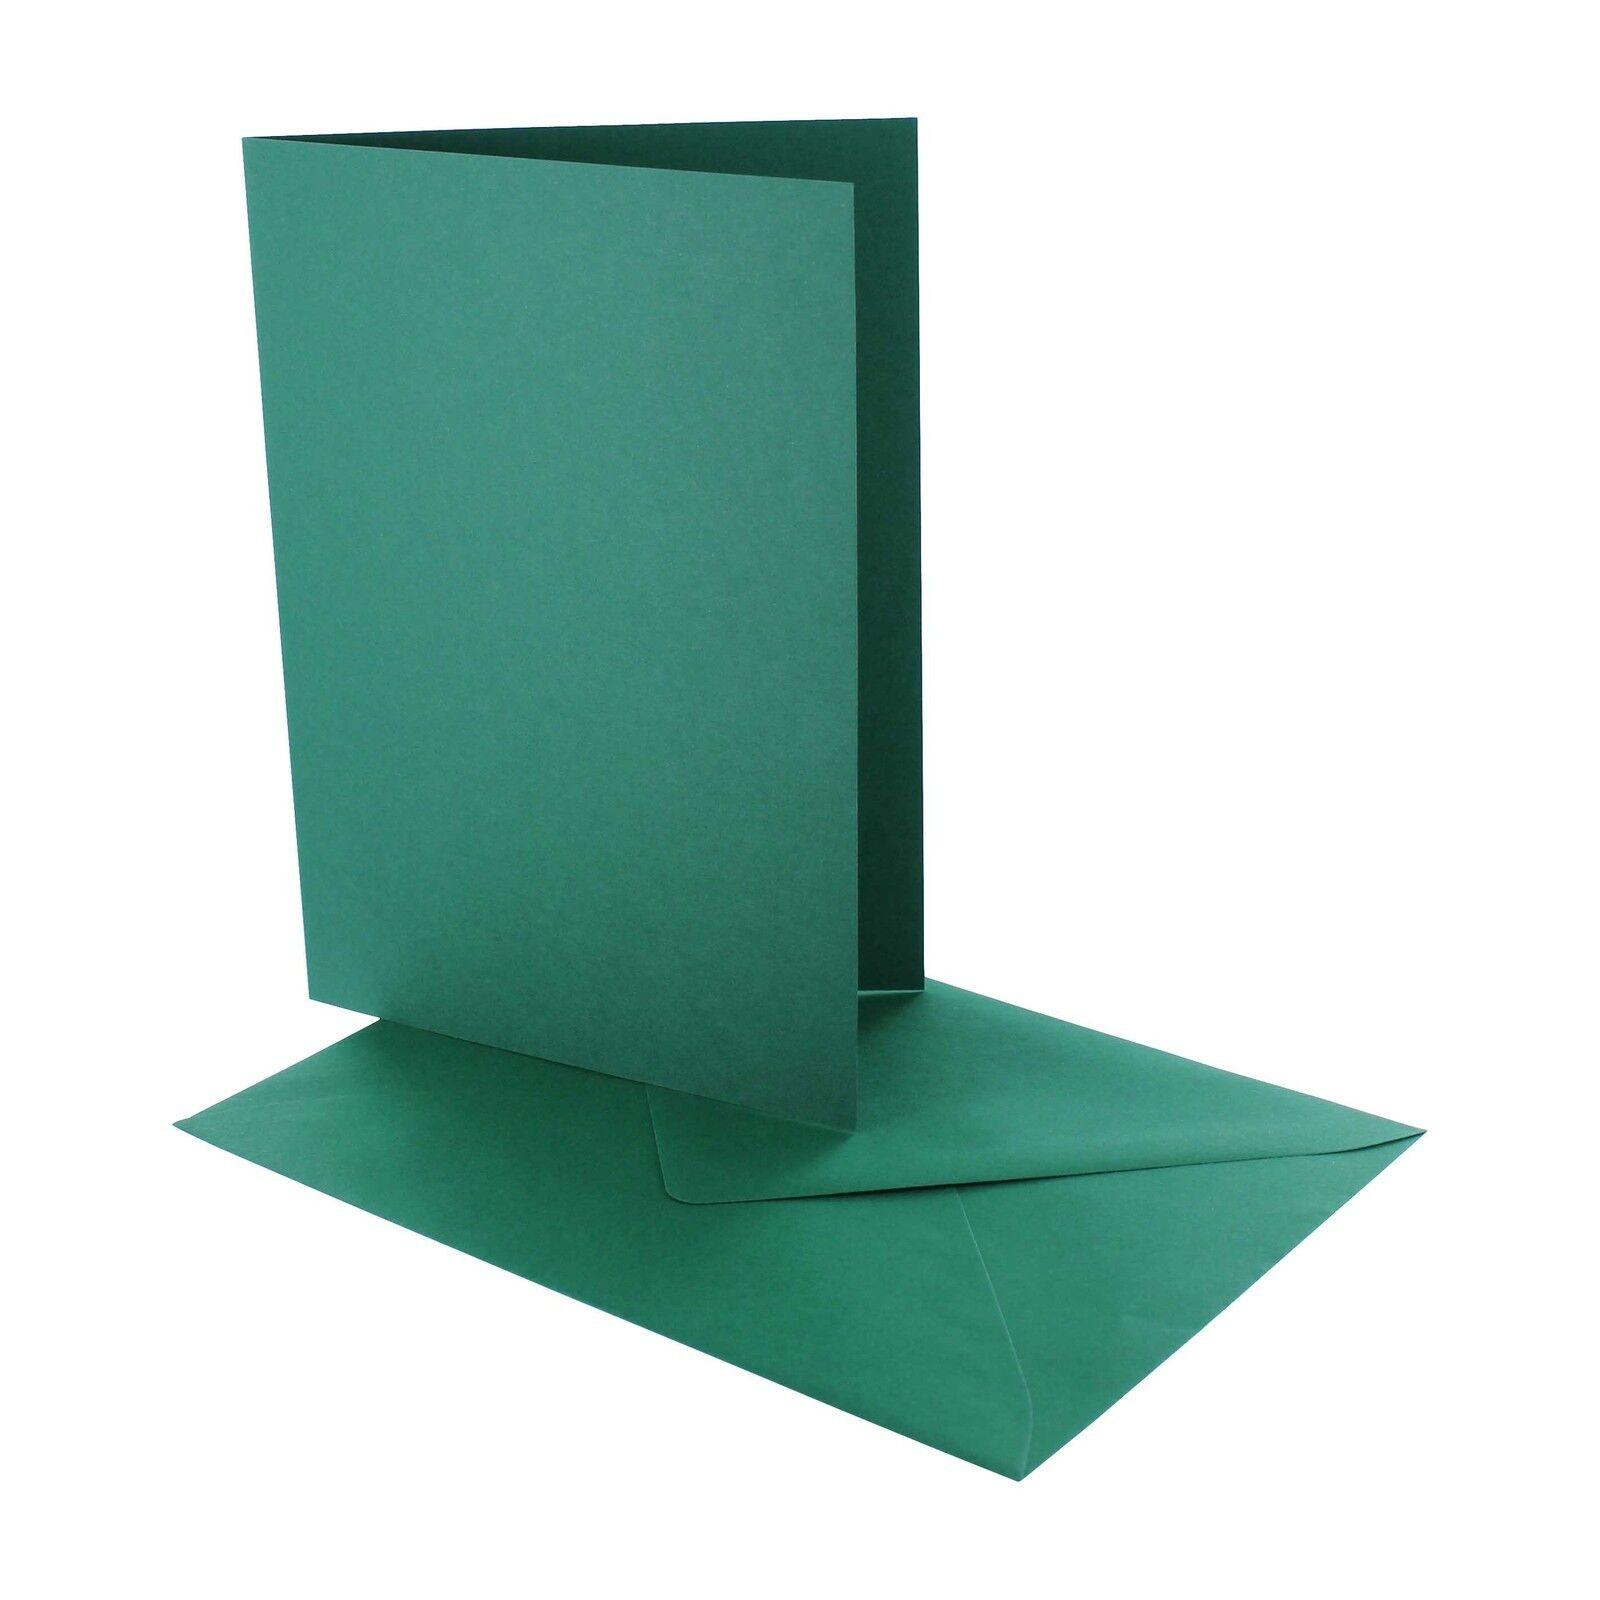 50 Blankokarten Blankokarten Blankokarten Klappkarten DIN B6  225 g m² Hochformat mit KuGrüns in 14 Farben | Online Shop  | Clearance Sale  d45f7b